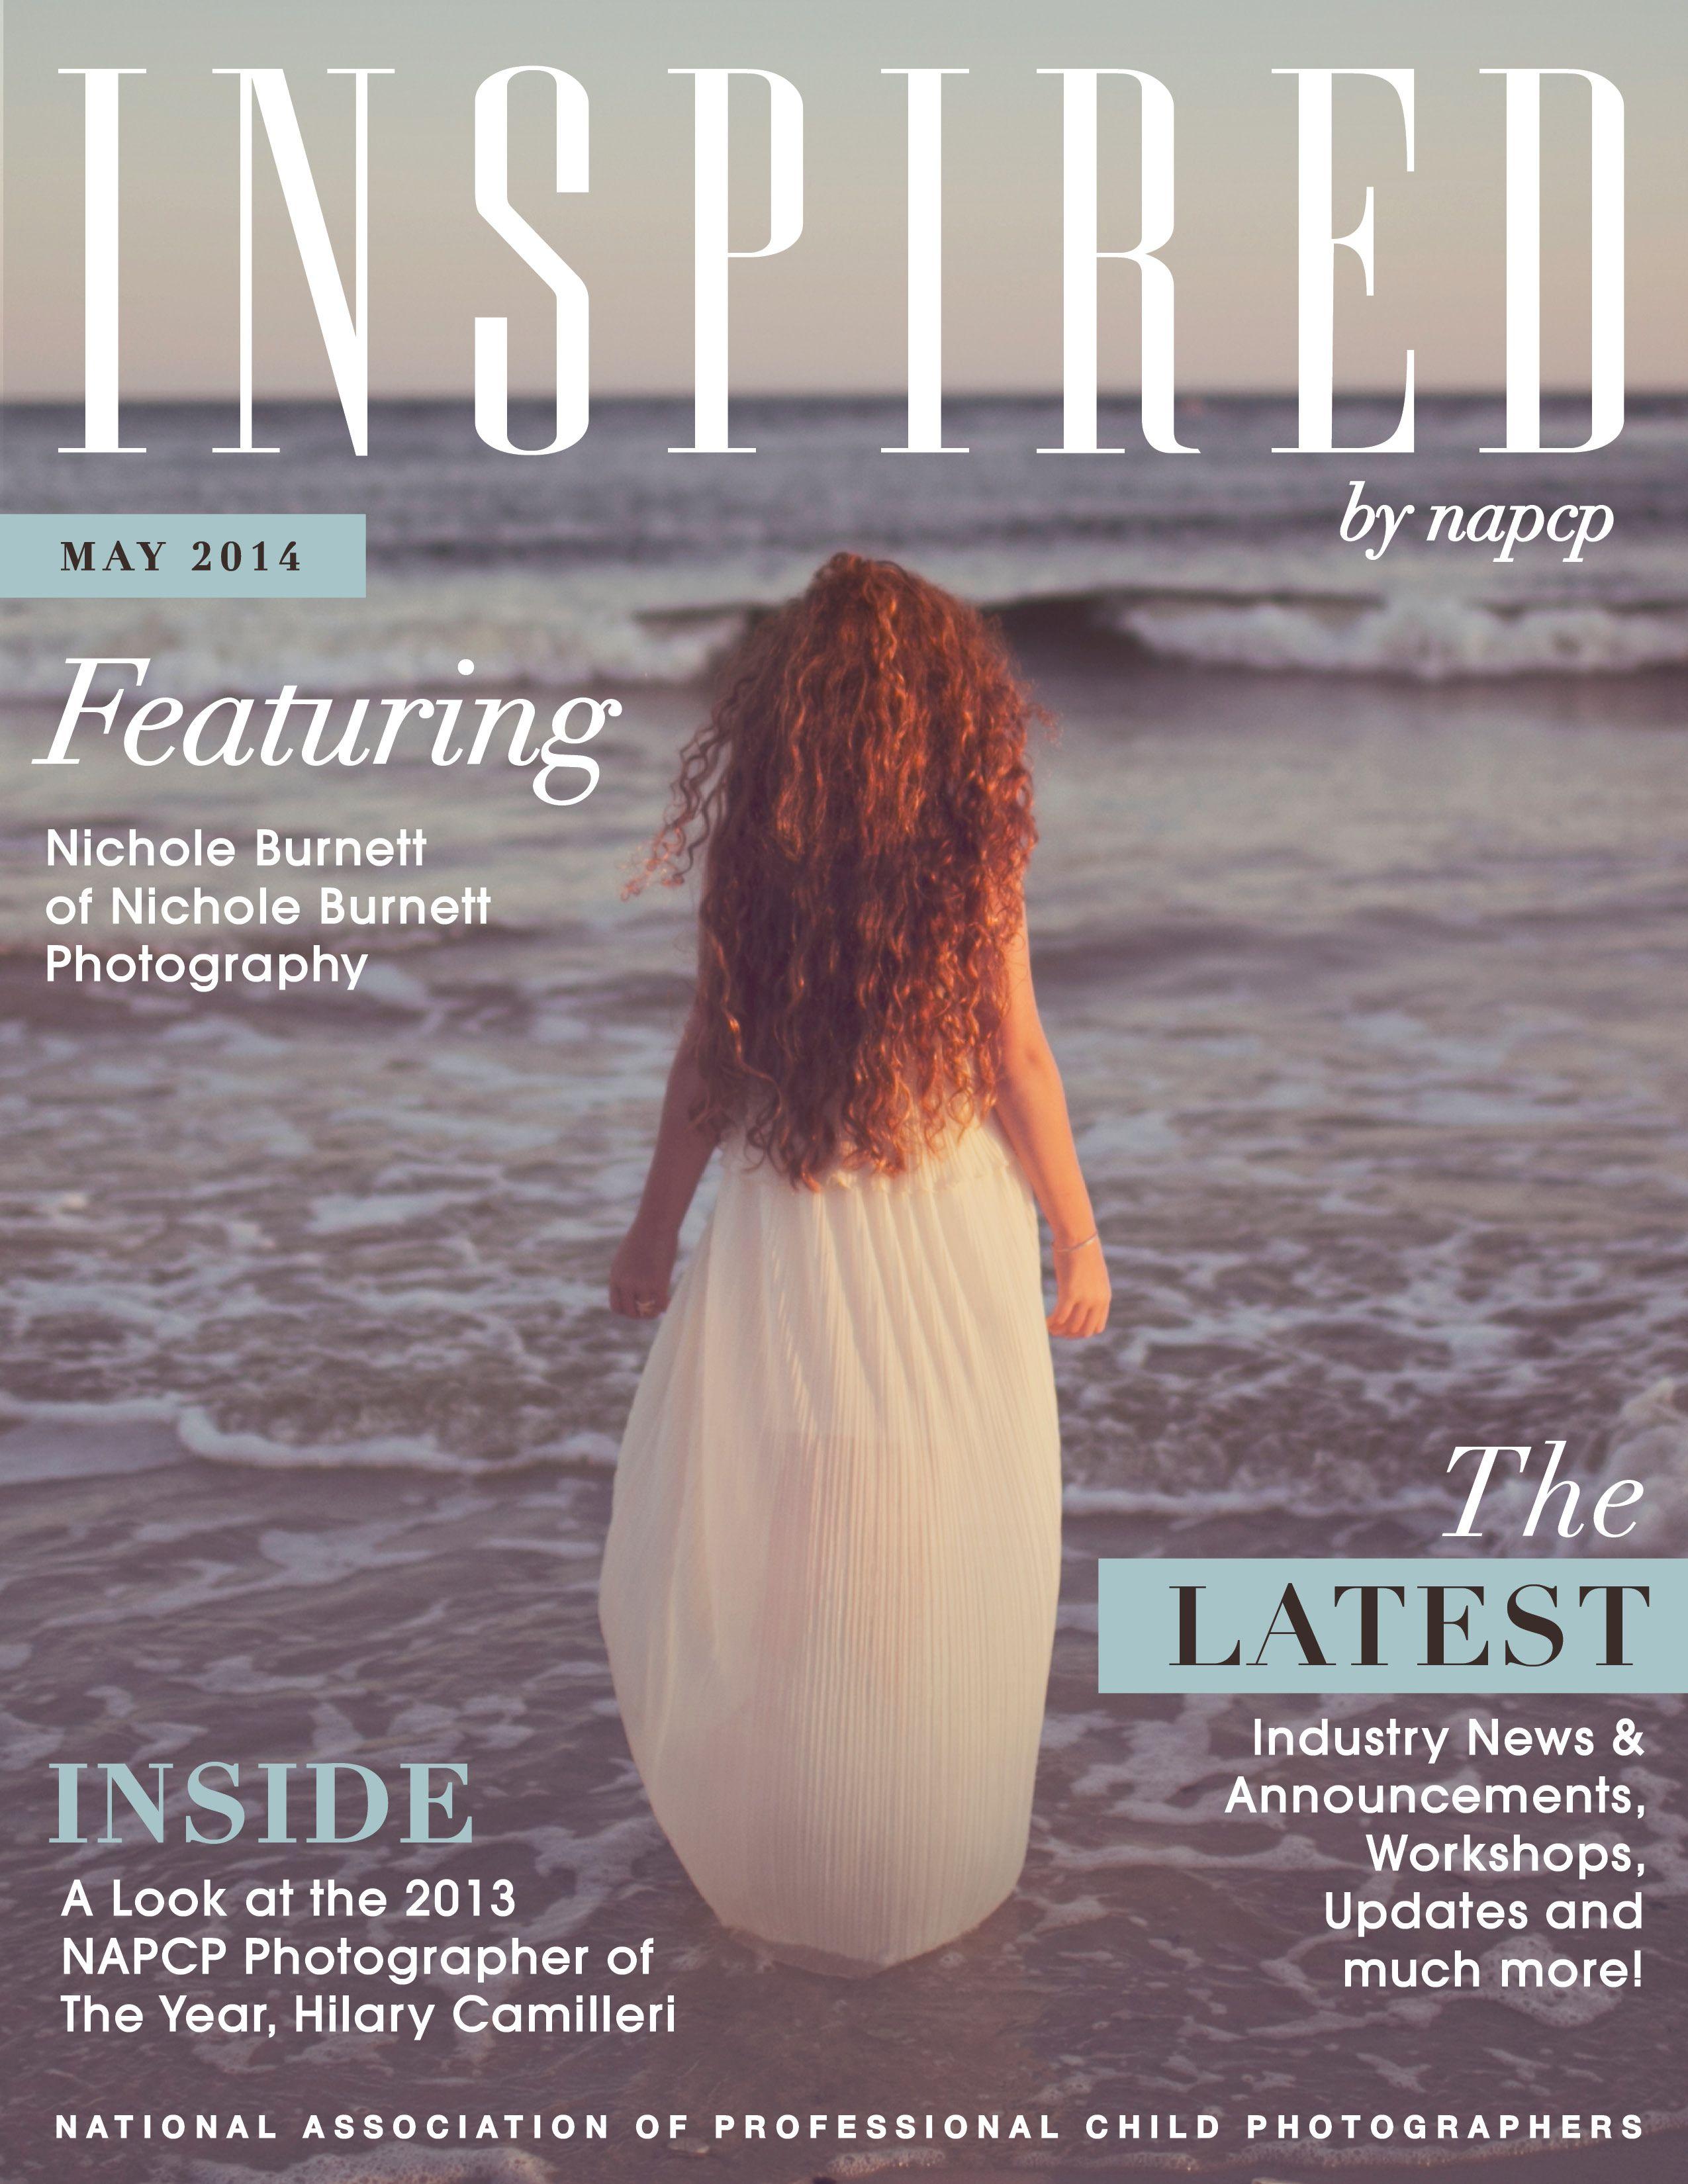 NAPCP May 2014 Newsletter featuring Nichole Burnett! #photographer #inspired #redhair #nicholeburnett @Nichole Burnett #napcp